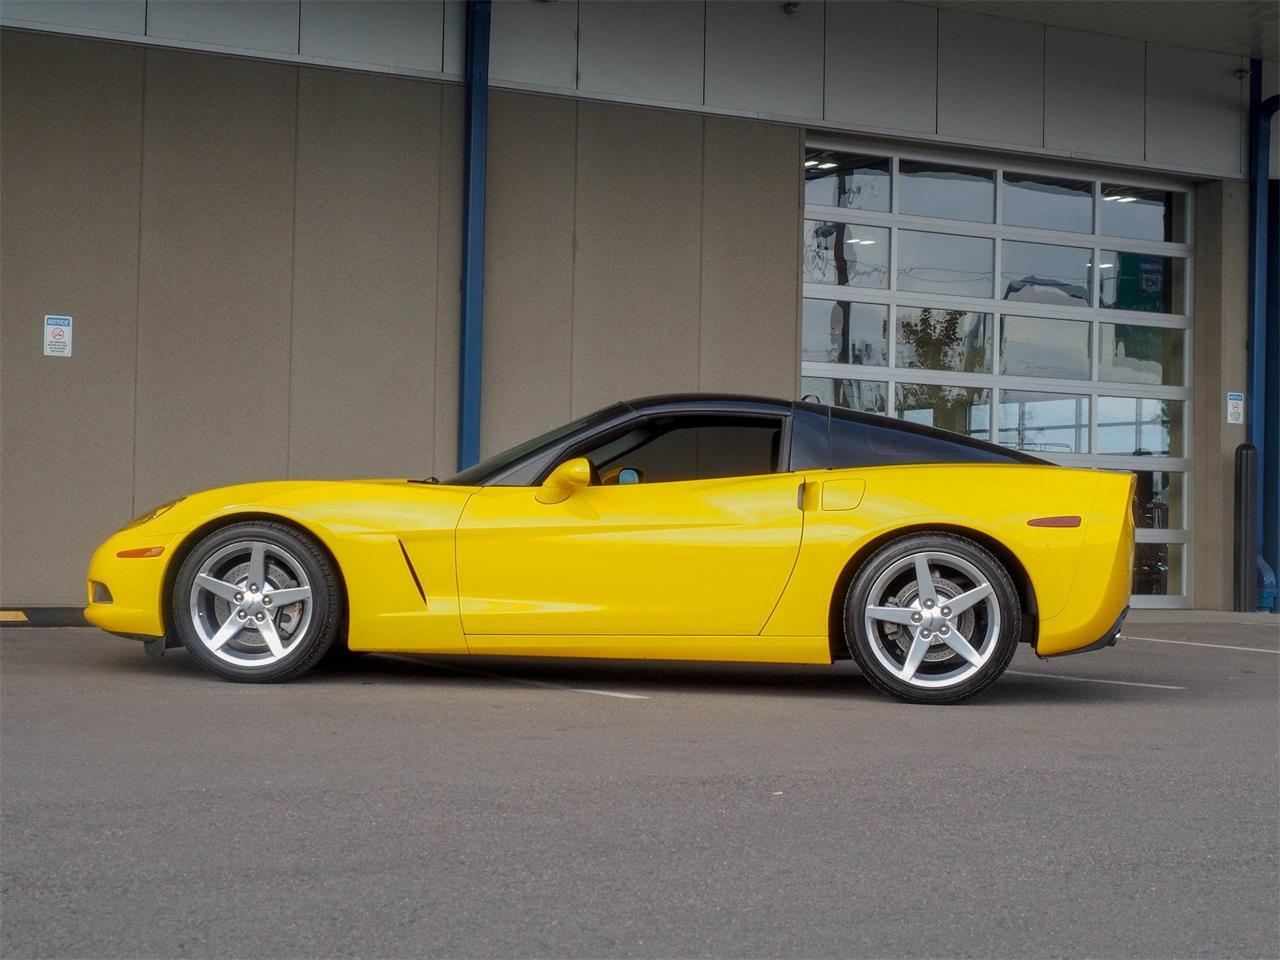 2005 Chevrolet Corvette (CC-1416124) for sale in Englewood, Colorado